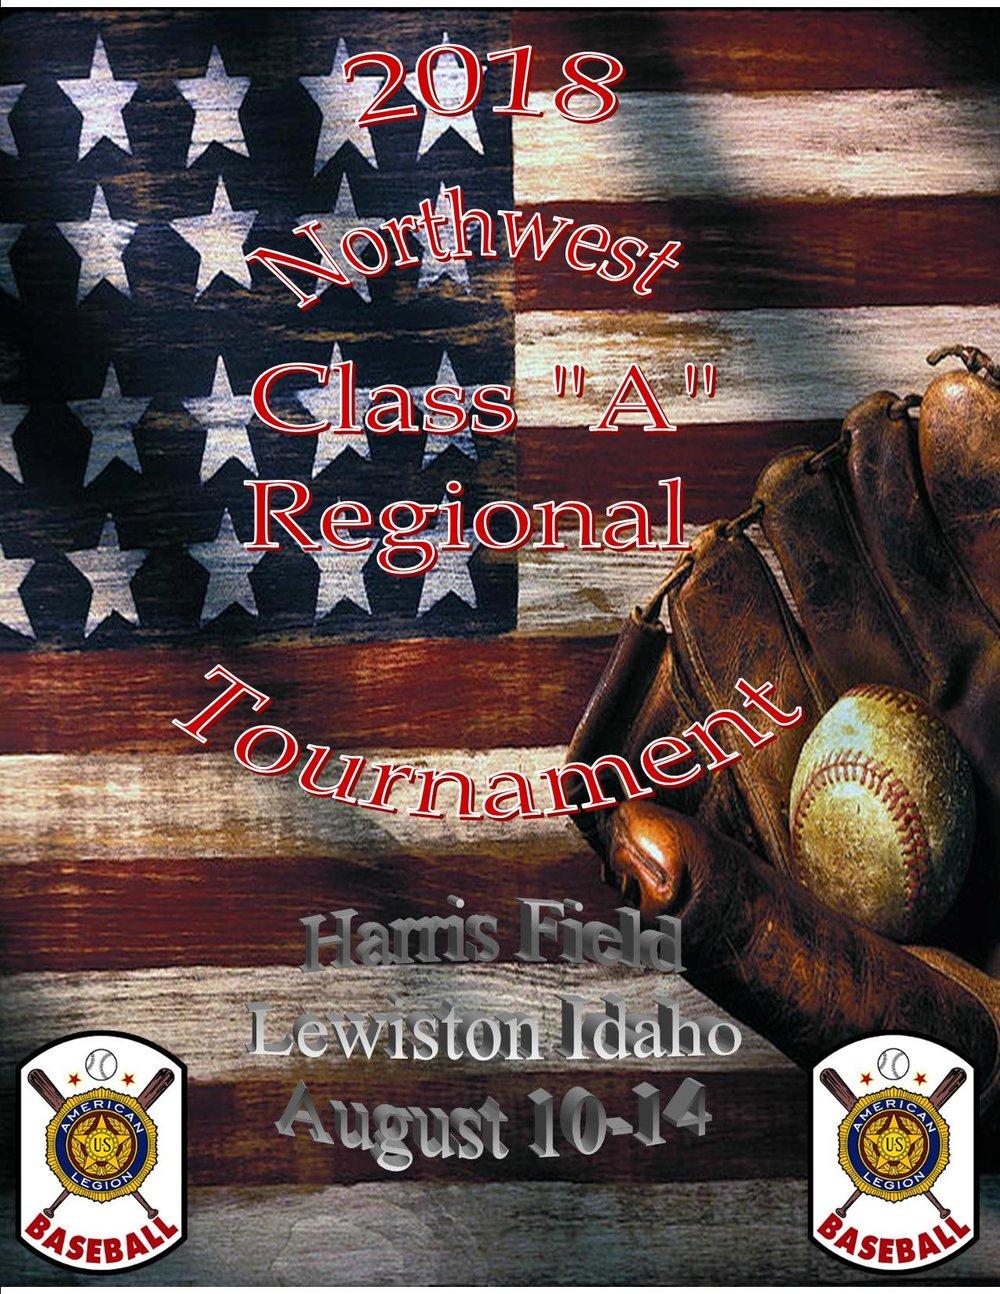 Regional front cover #1.jpg